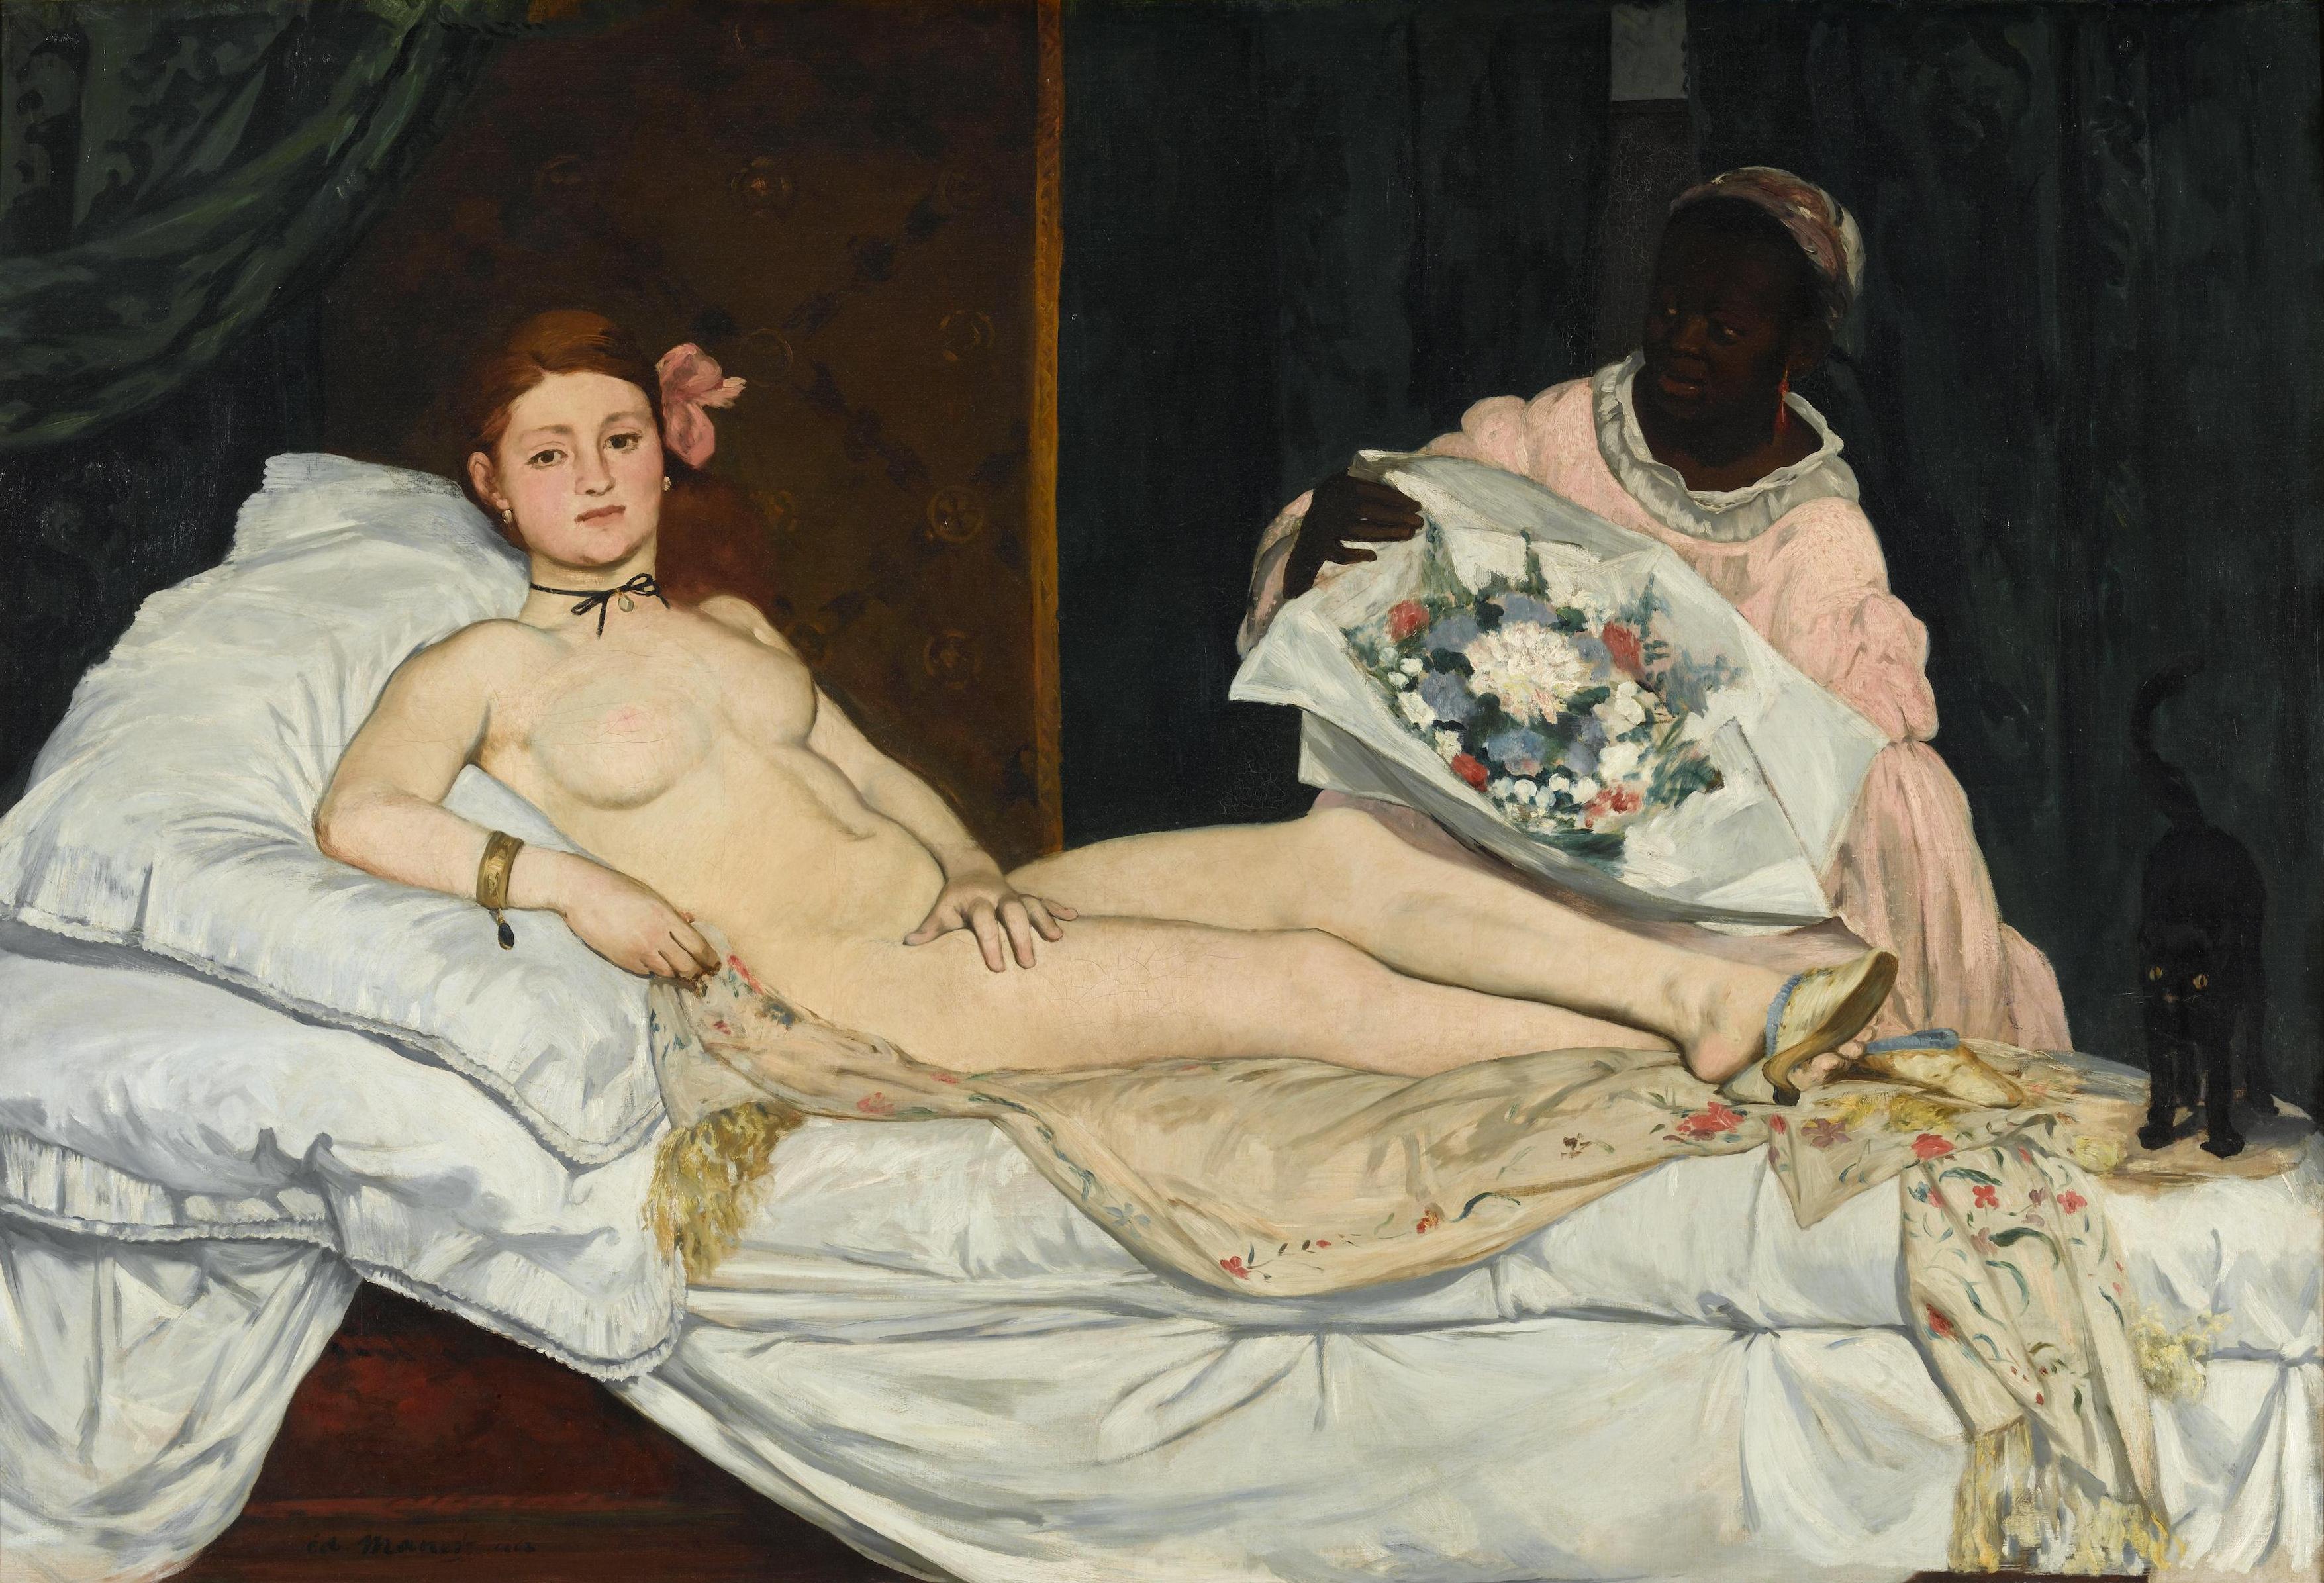 https://i1.wp.com/upload.wikimedia.org/wikipedia/commons/5/5c/Edouard_Manet_-_Olympia_-_Google_Art_Project_3.jpg